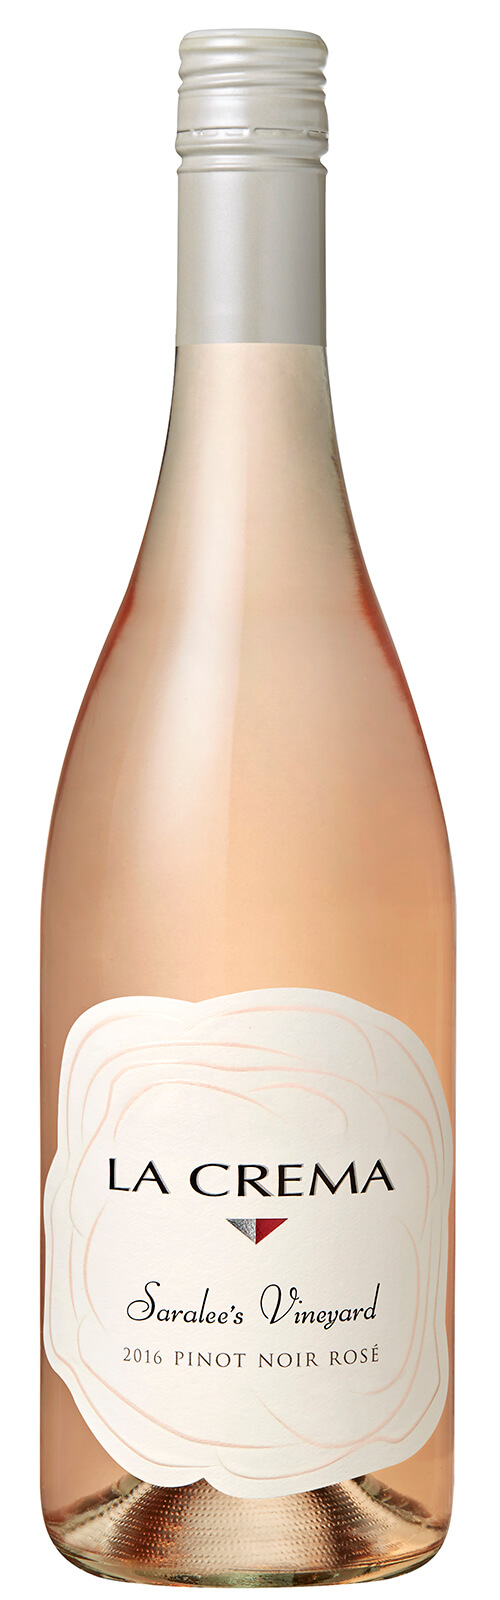 2016 Saralee's Vineyard Pinot Noir Rosé